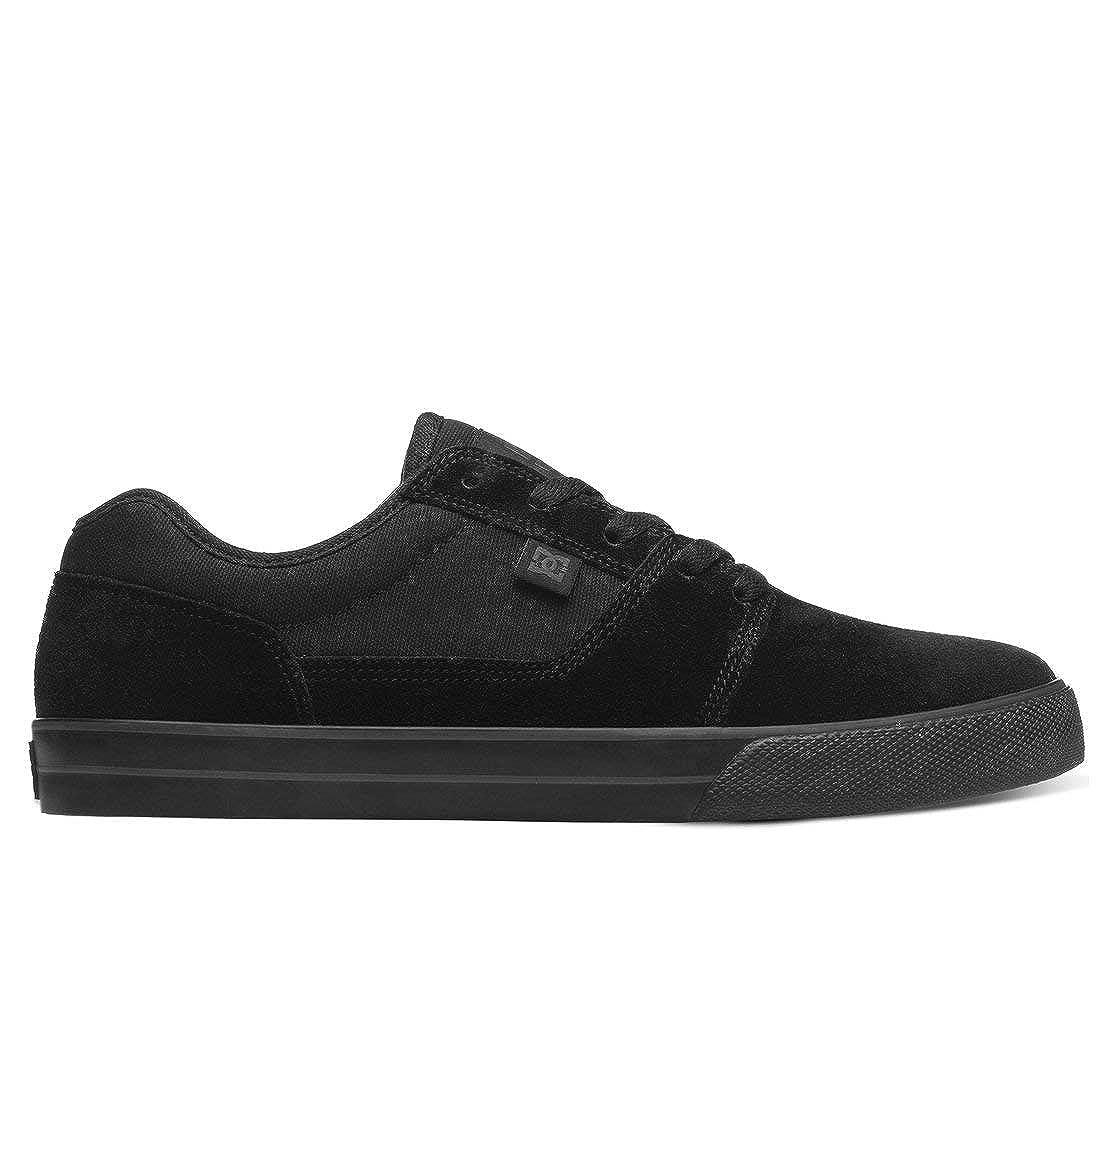 TALLA 41 EU. DC Shoes Tonik Shoe, Zapatillas para Hombre